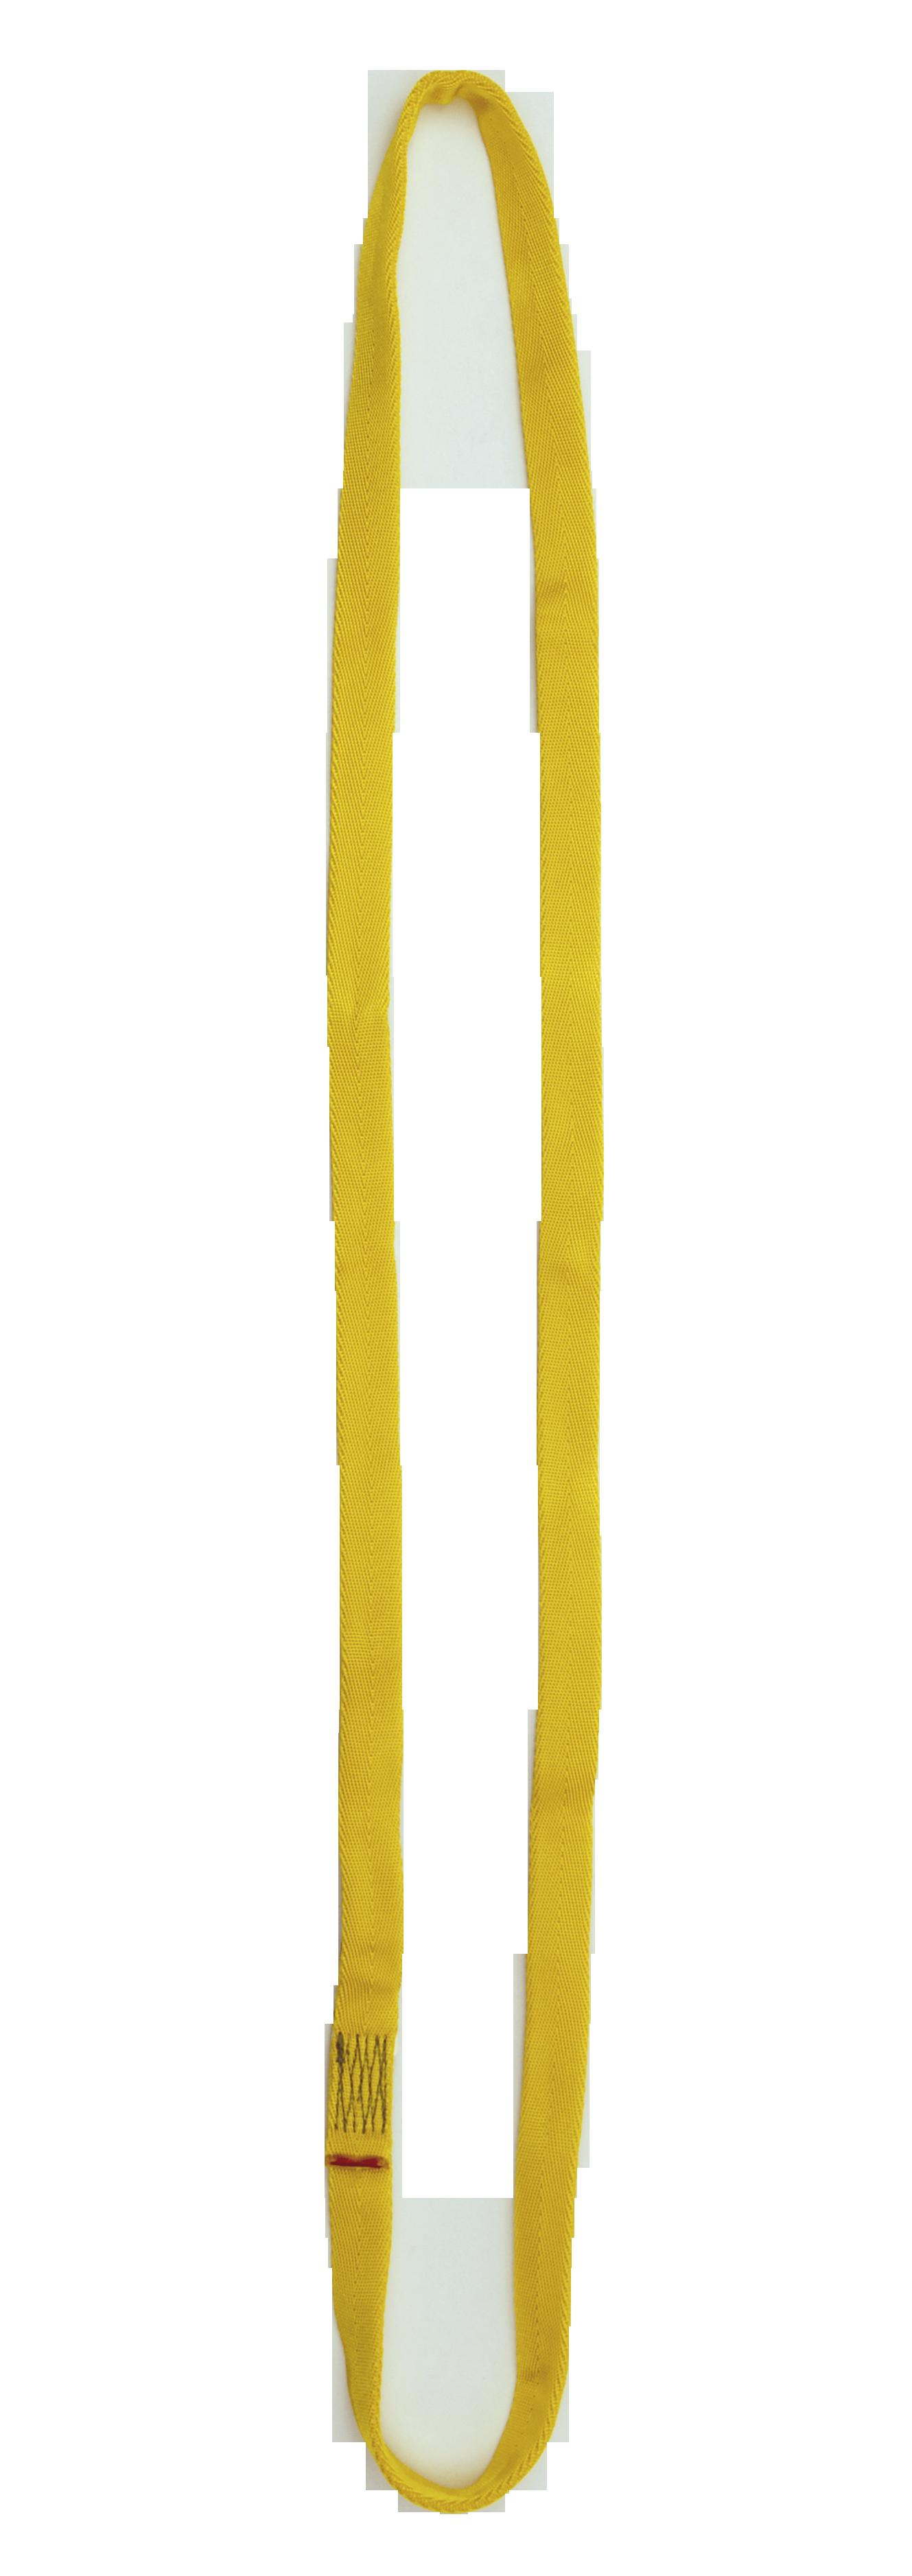 Image of   Monteringsstrop Skylotec 0,6 m